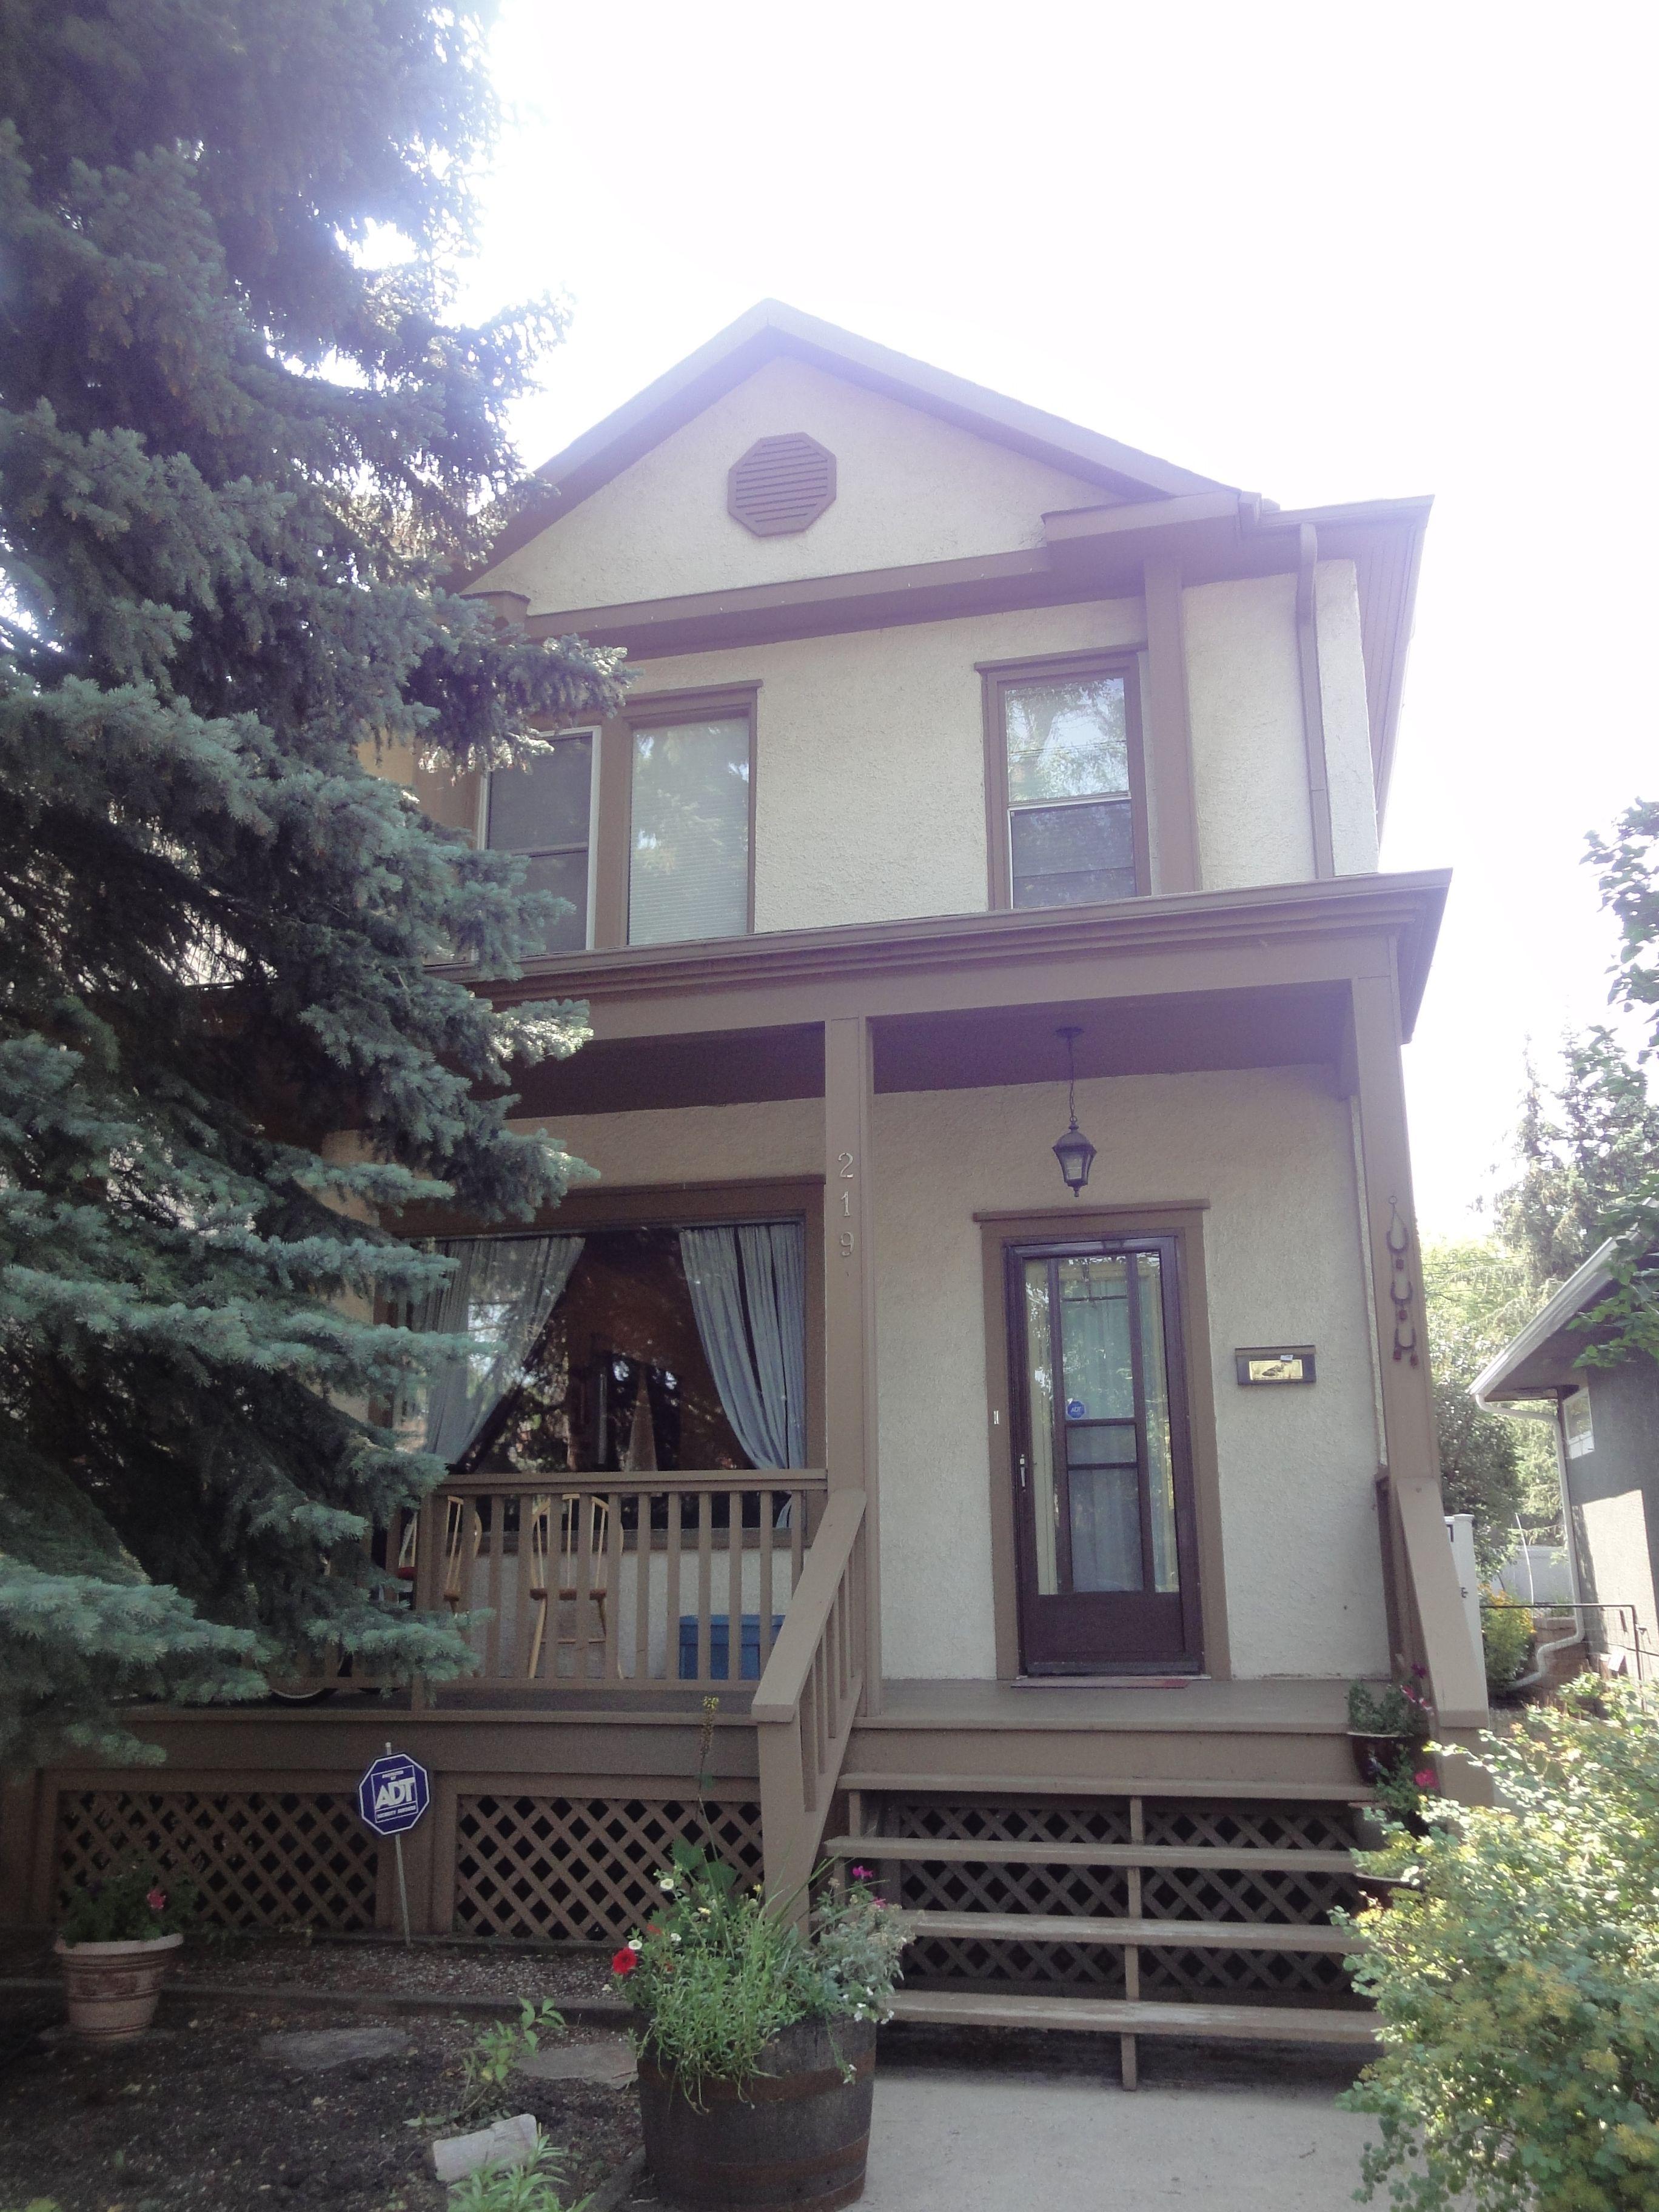 Crescent Heights219 8 ave NE Calgary Outdoor decor